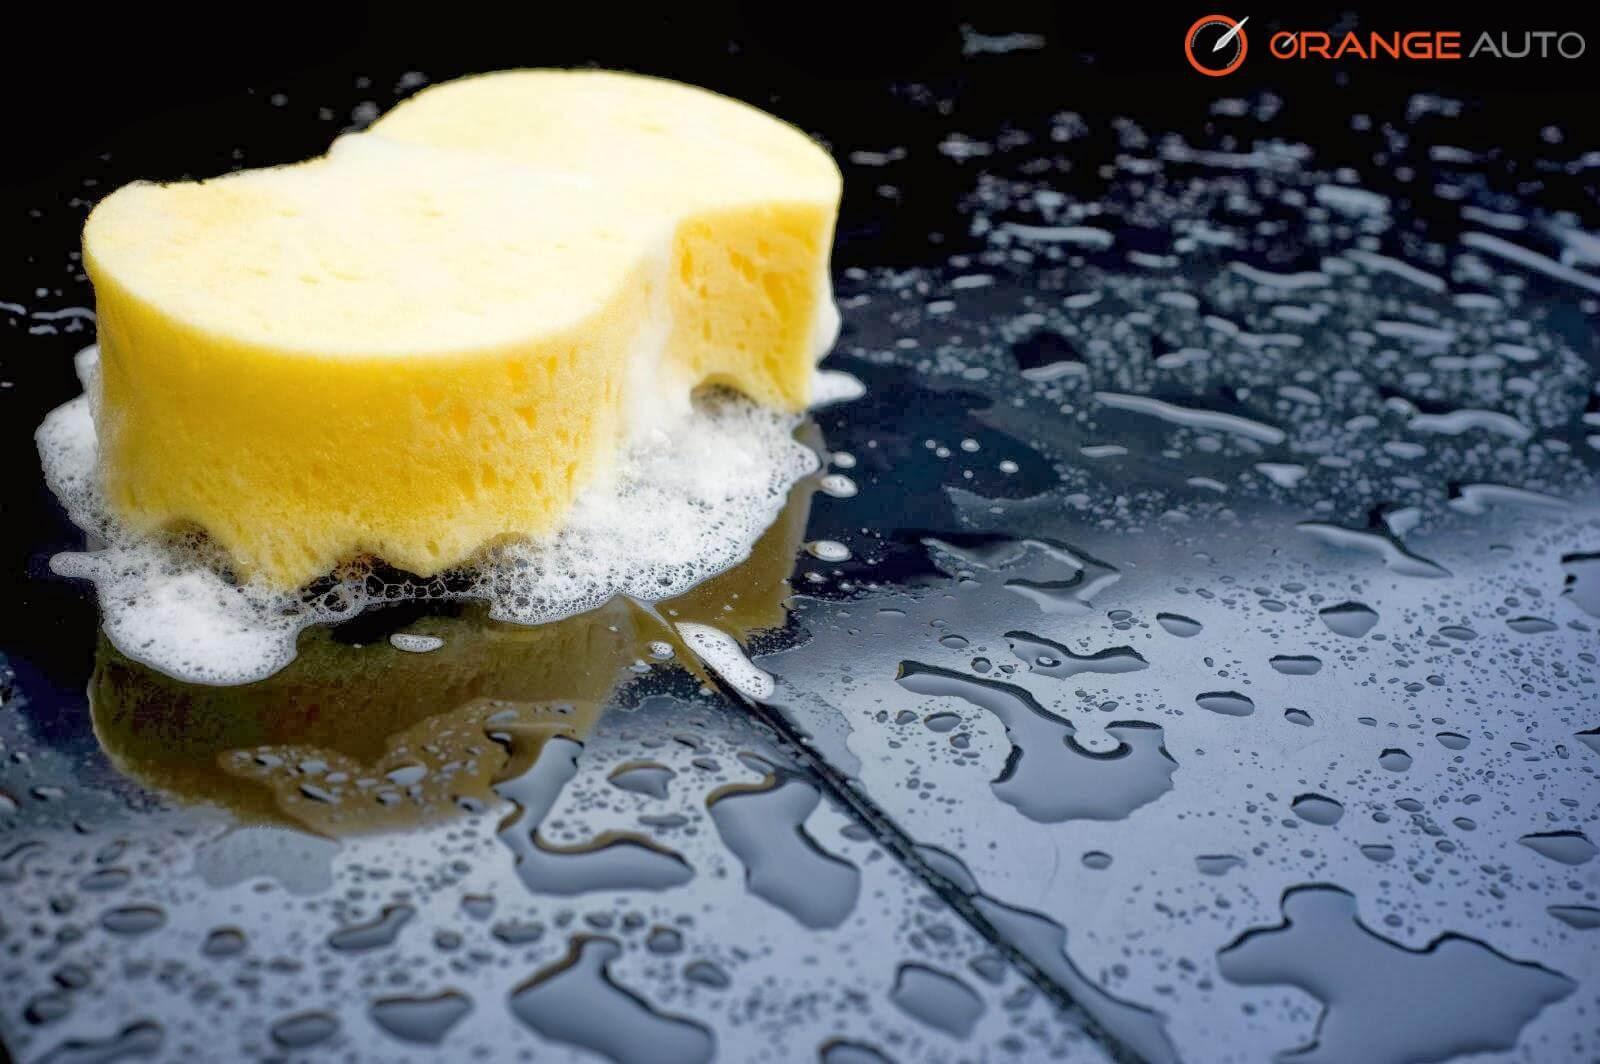 Car wash at orange auto dubai